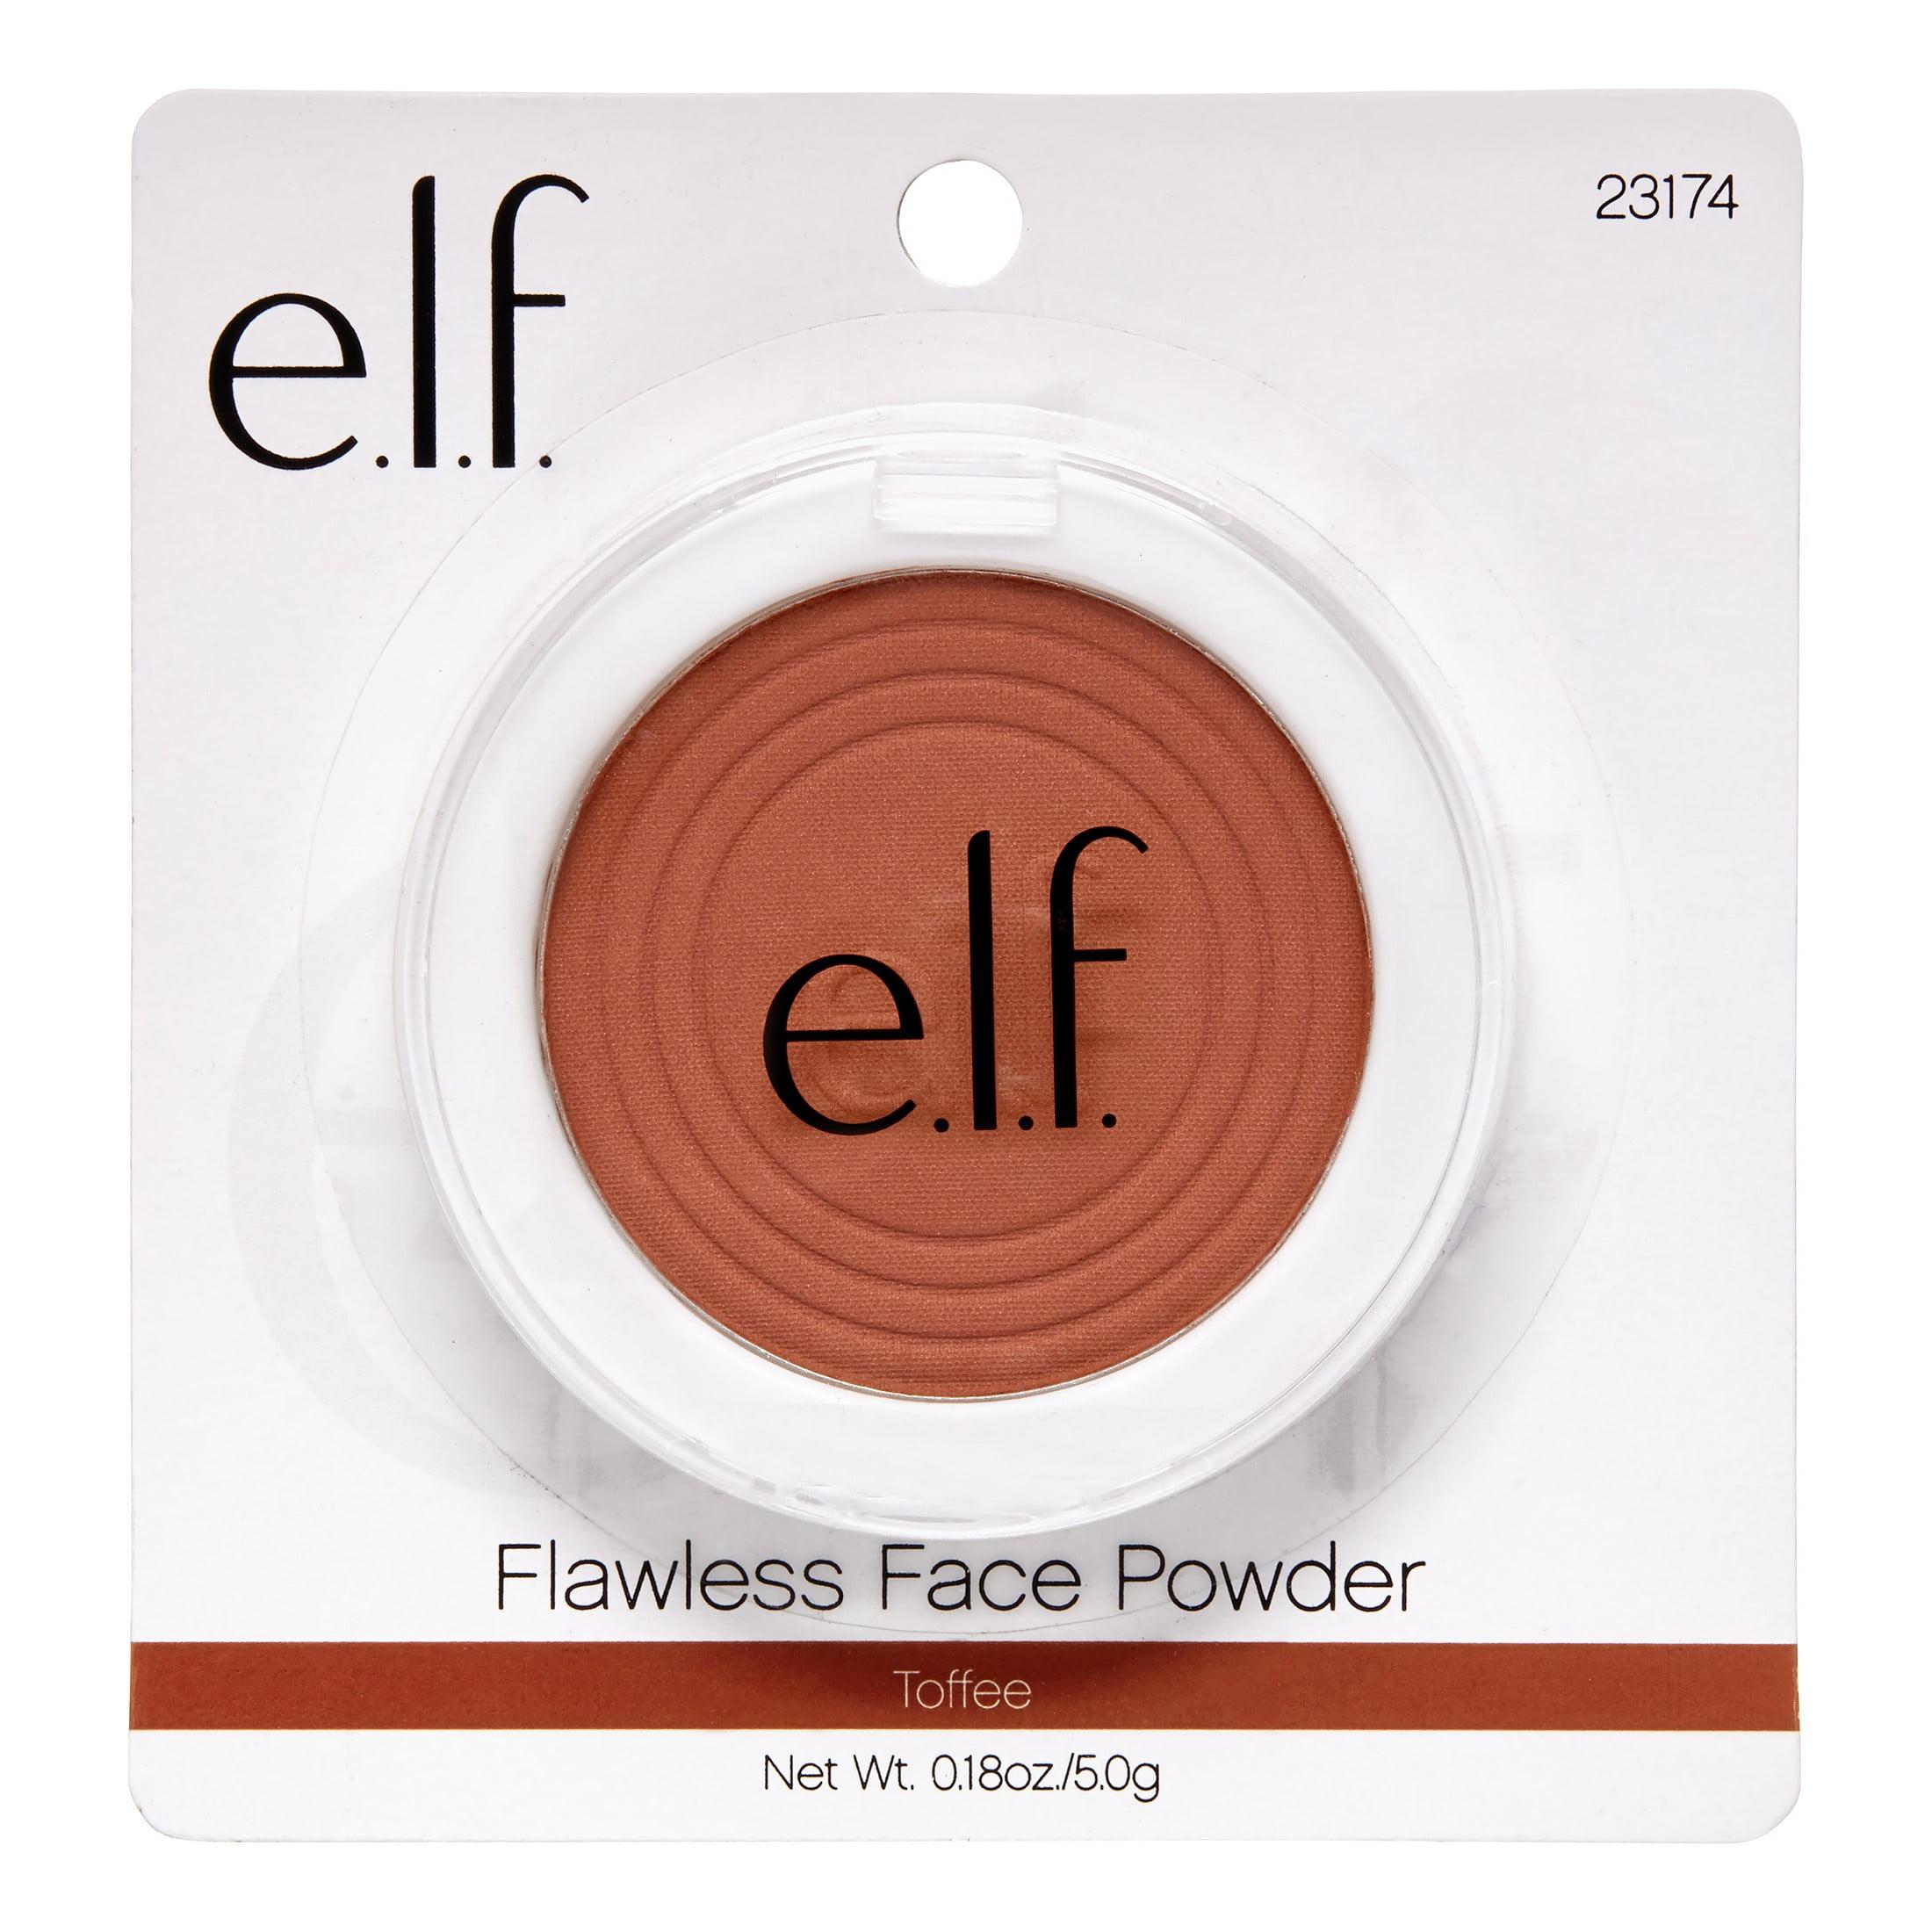 e.l.f. Flawless Face Powder, Toffee, 0.18 Oz